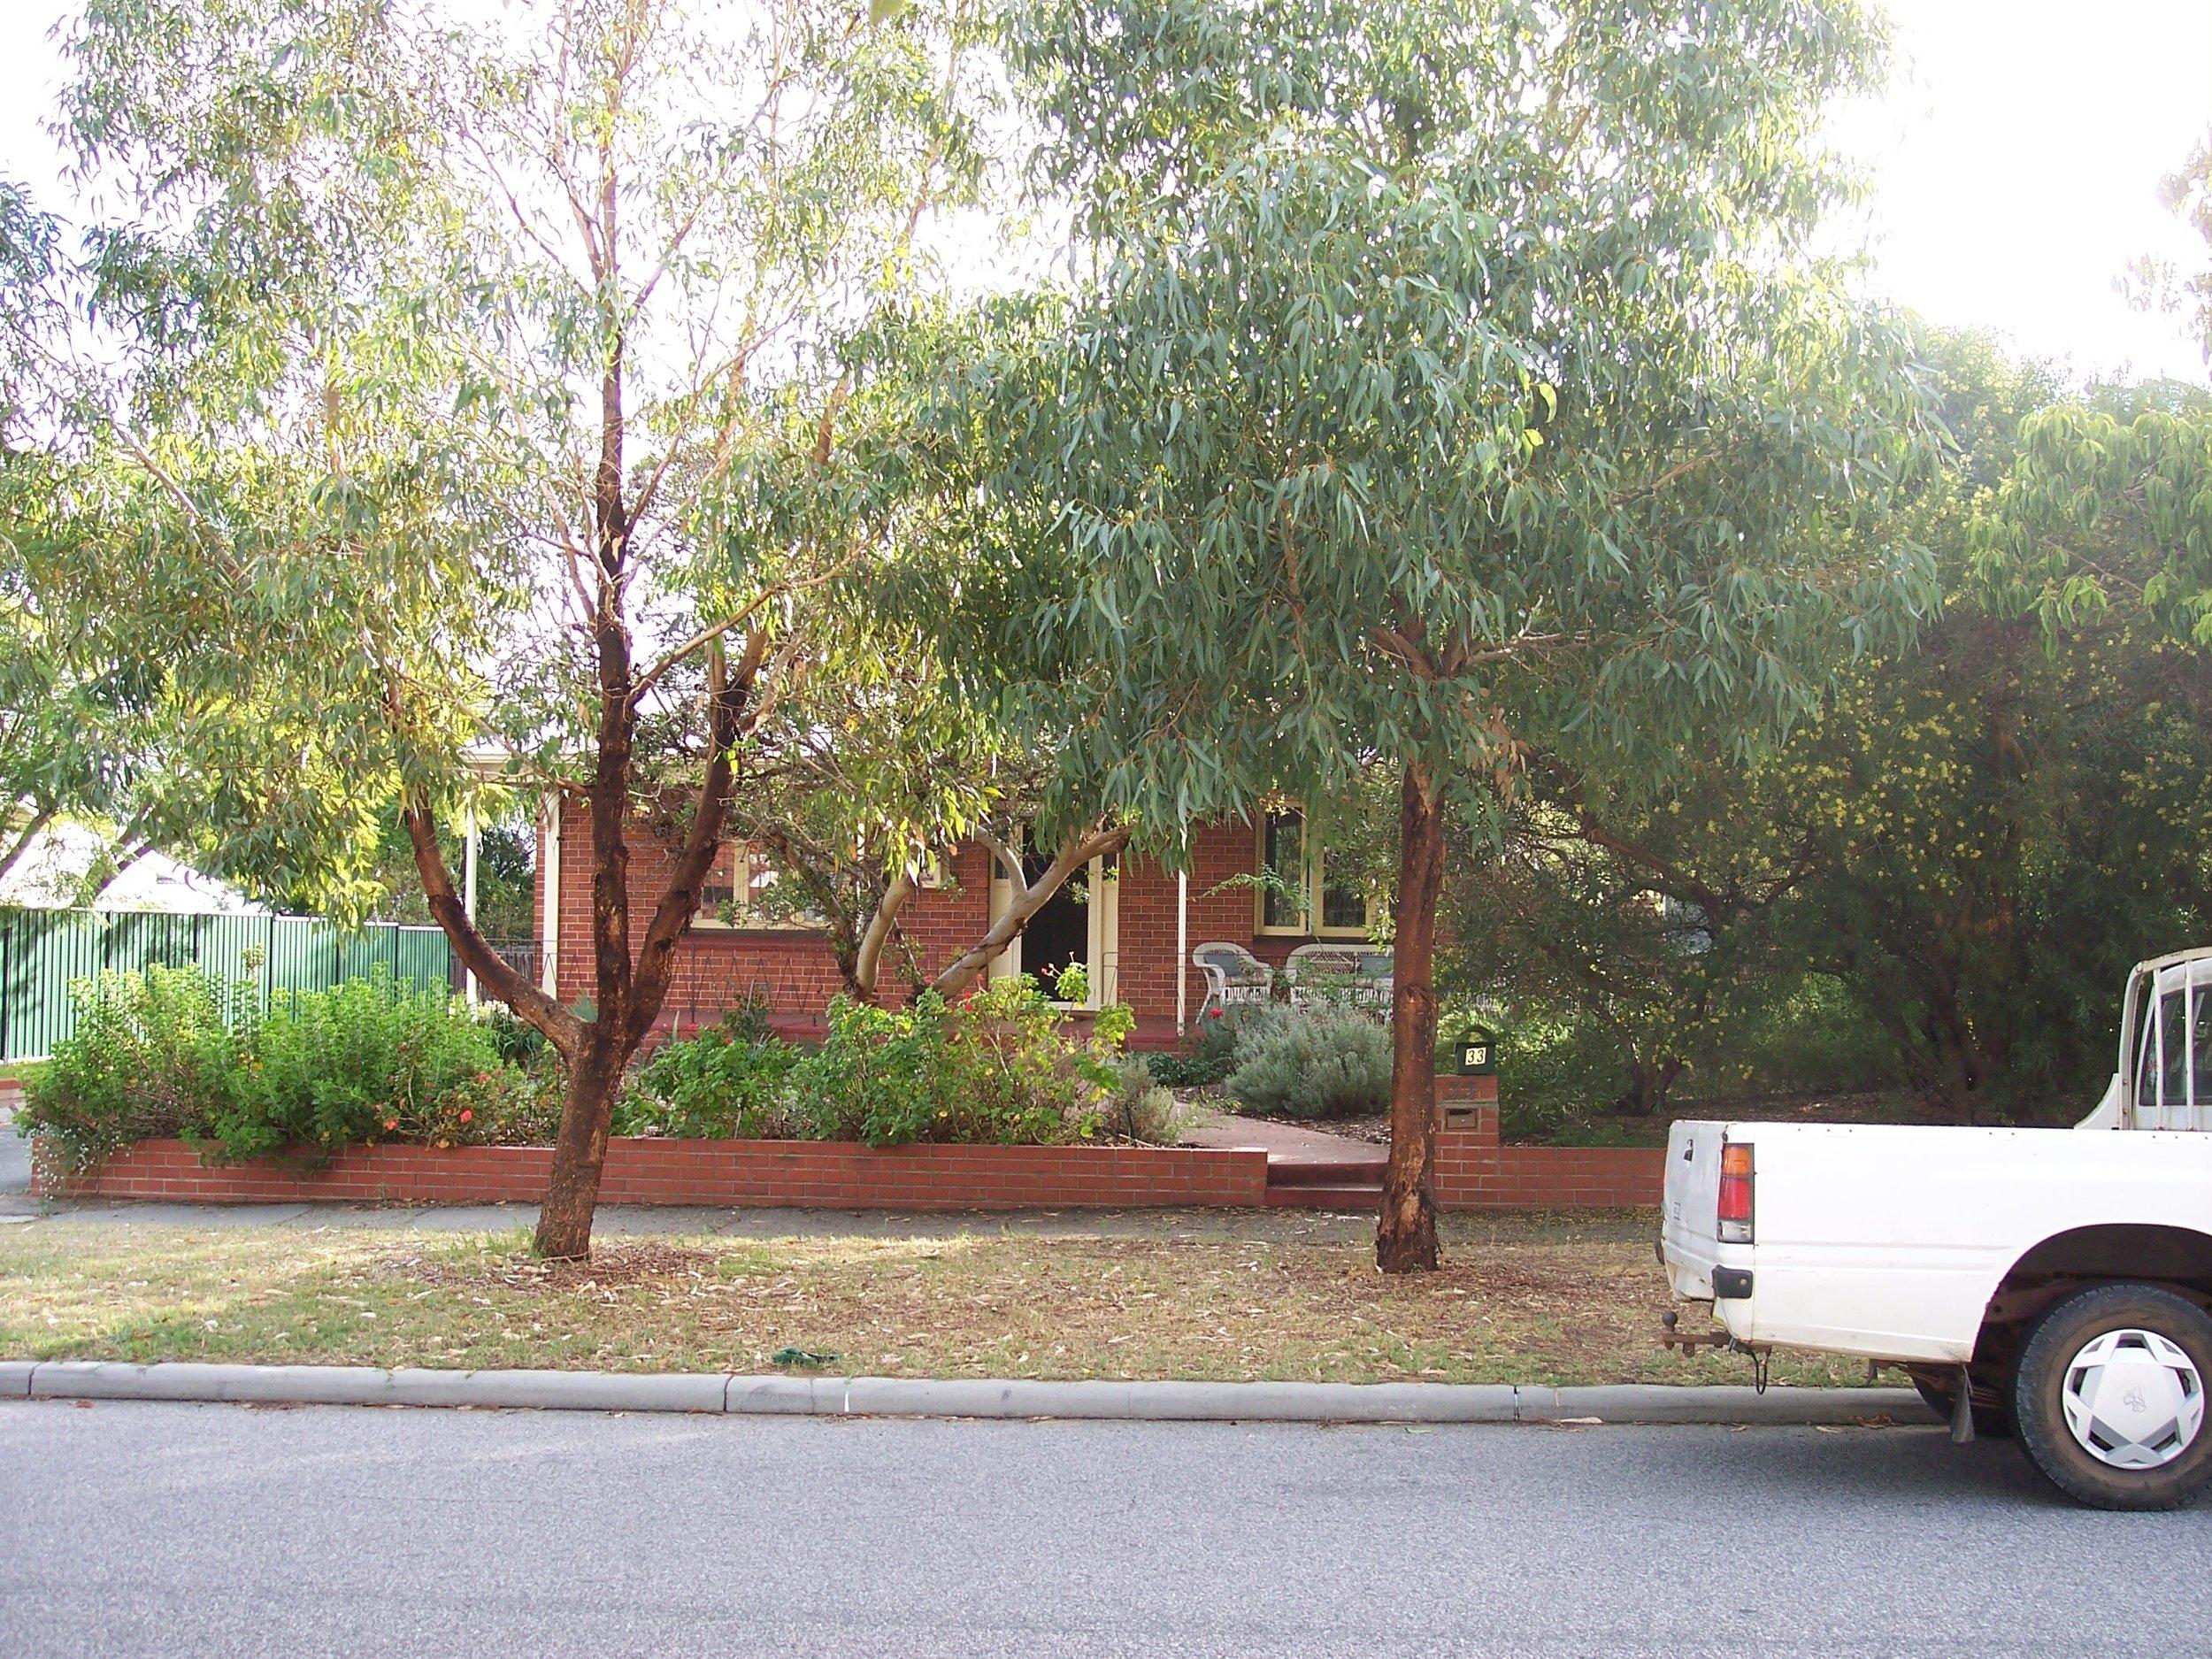 24-4-06 View W 33 Oakover St.jpg